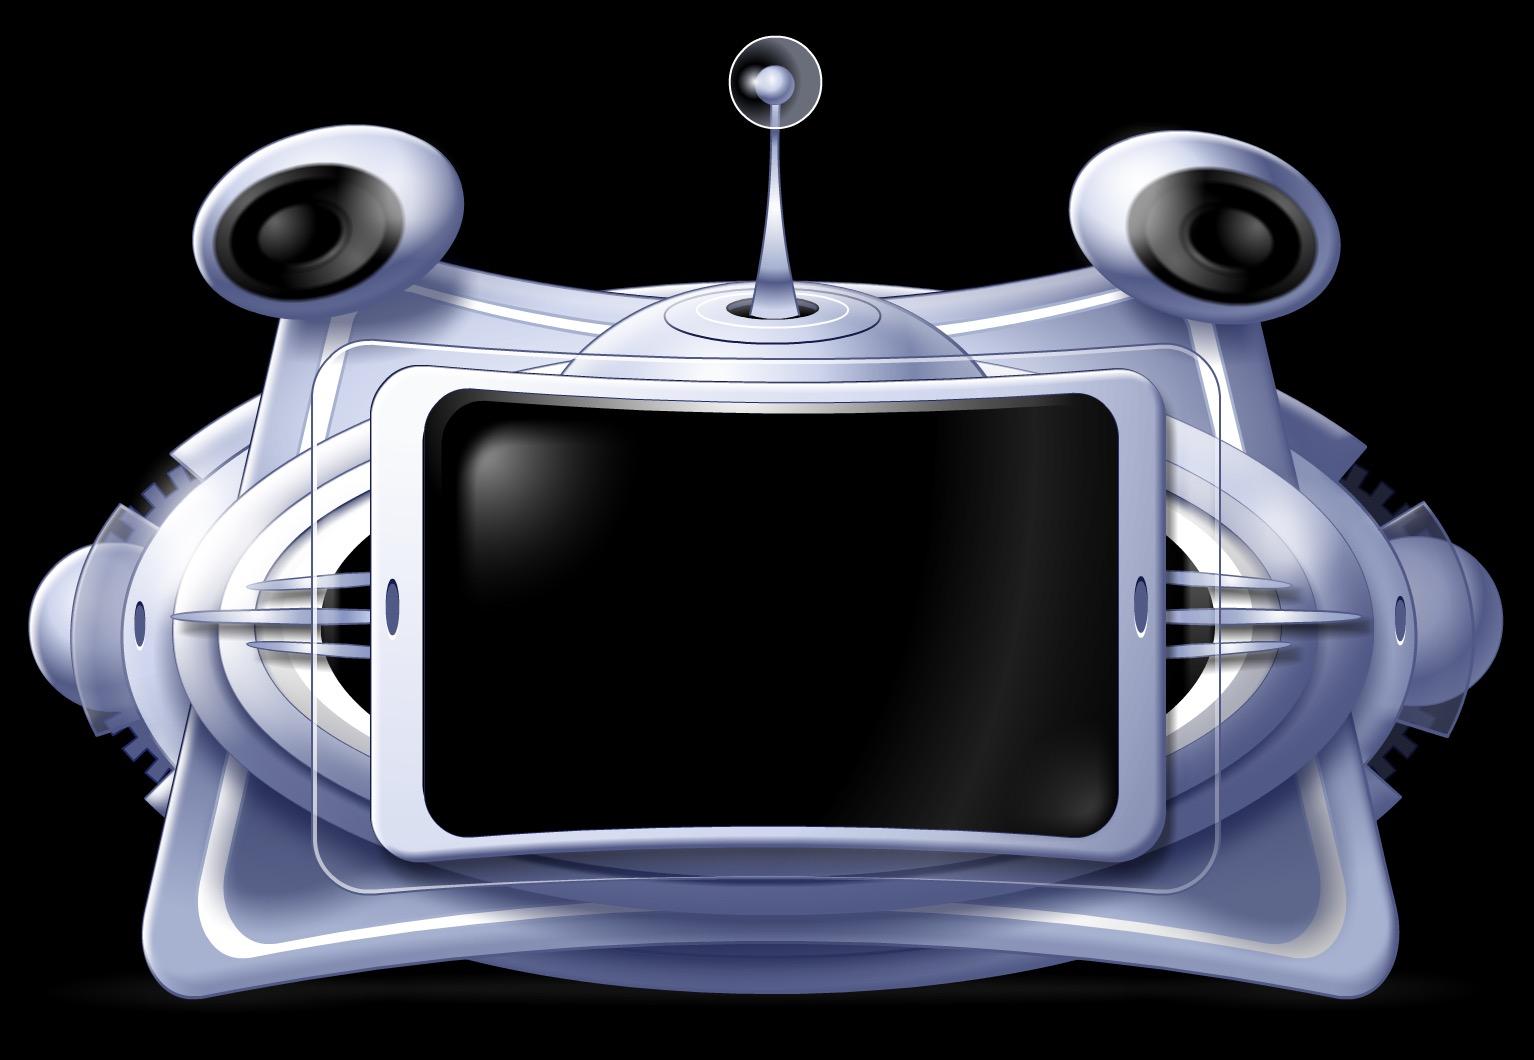 retro_futurism_video_preview